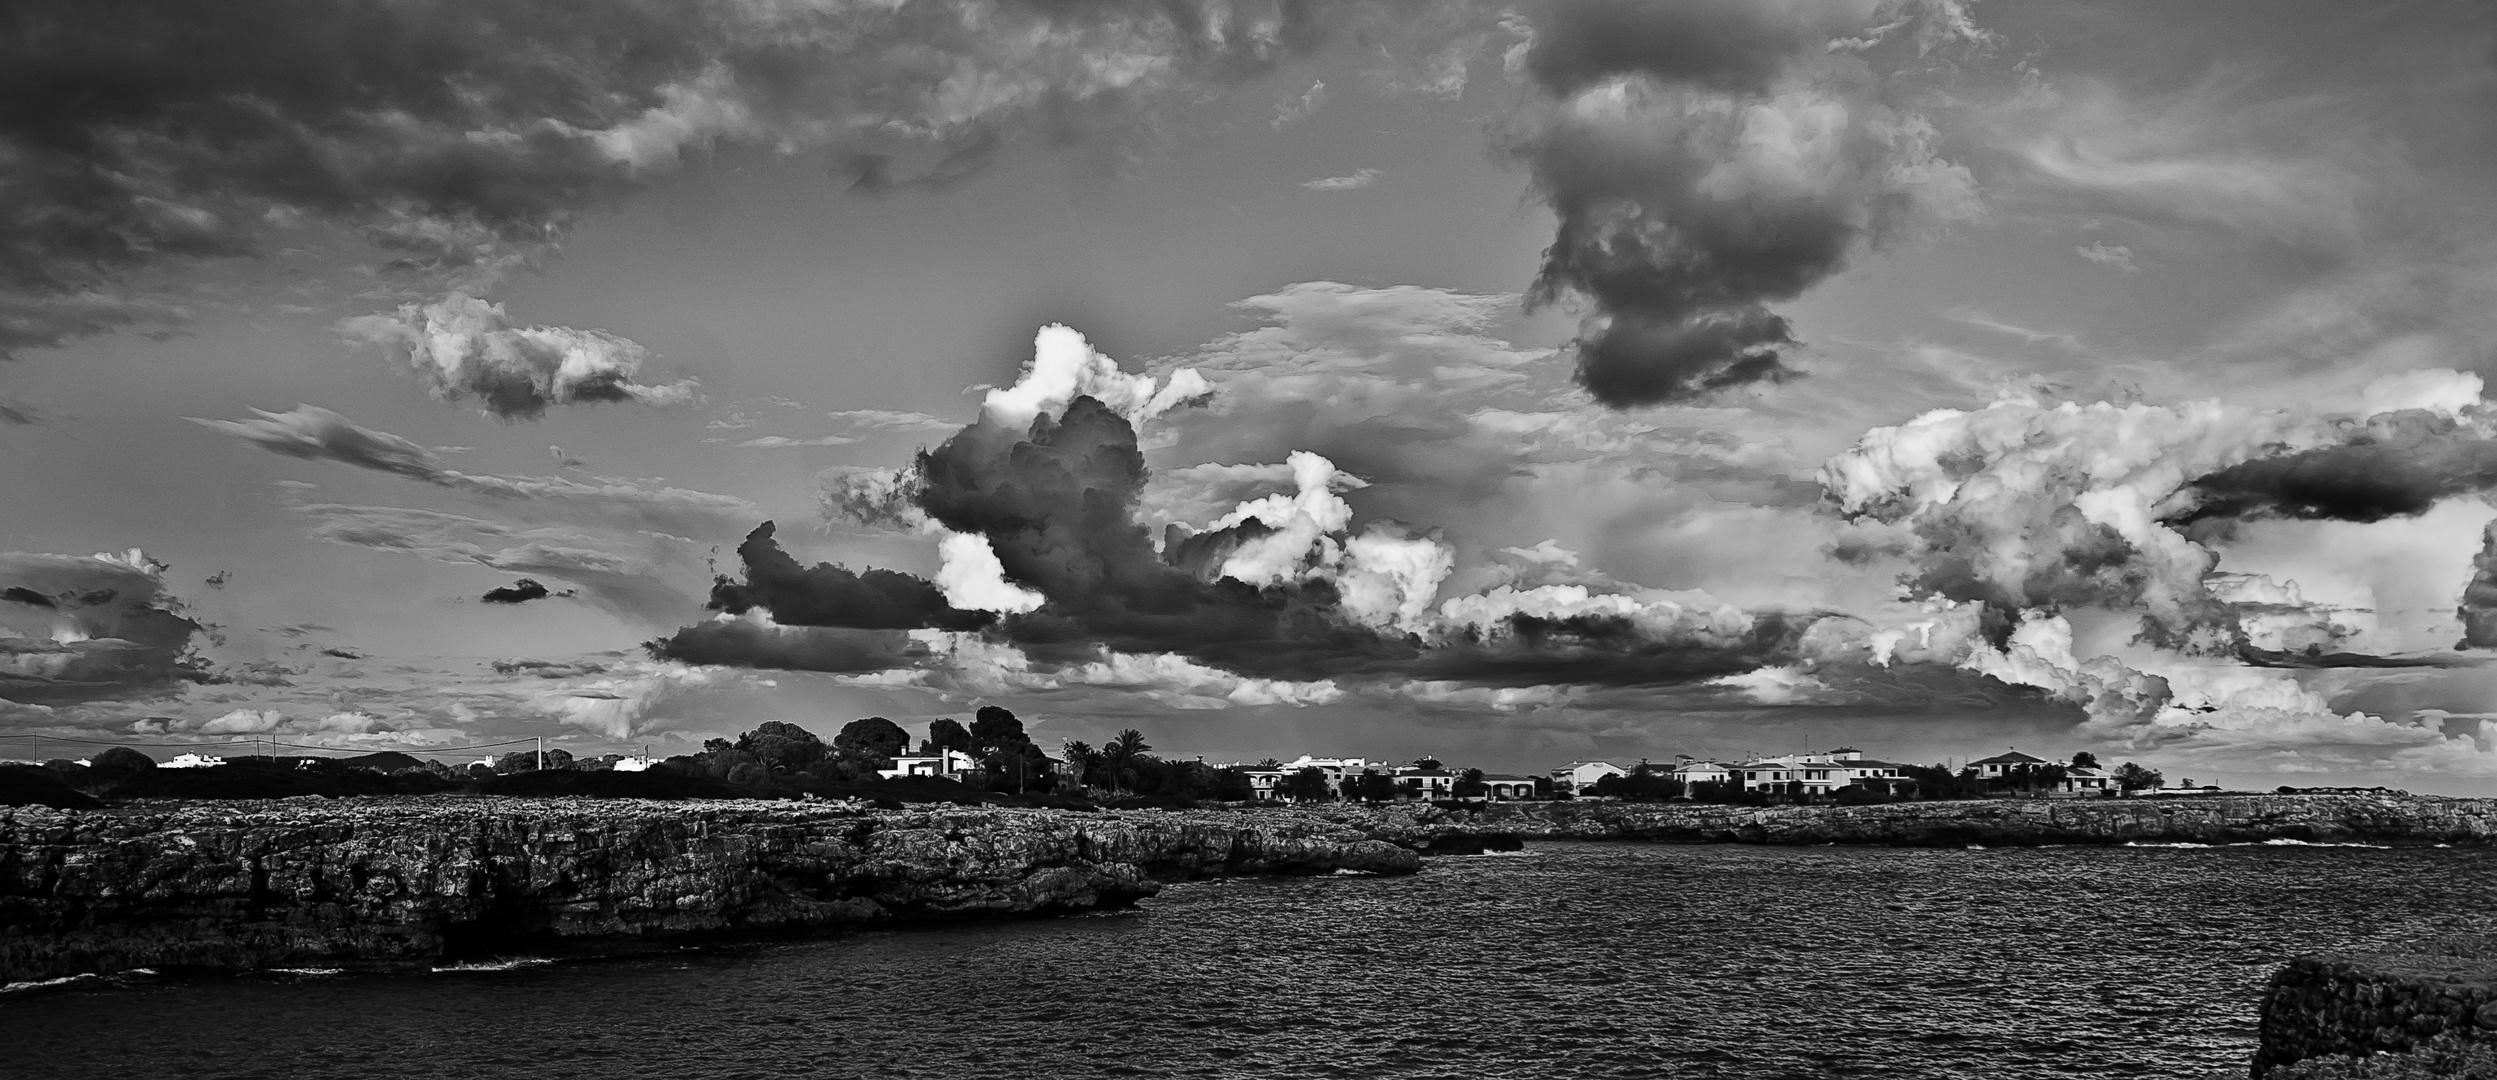 capturando nubes